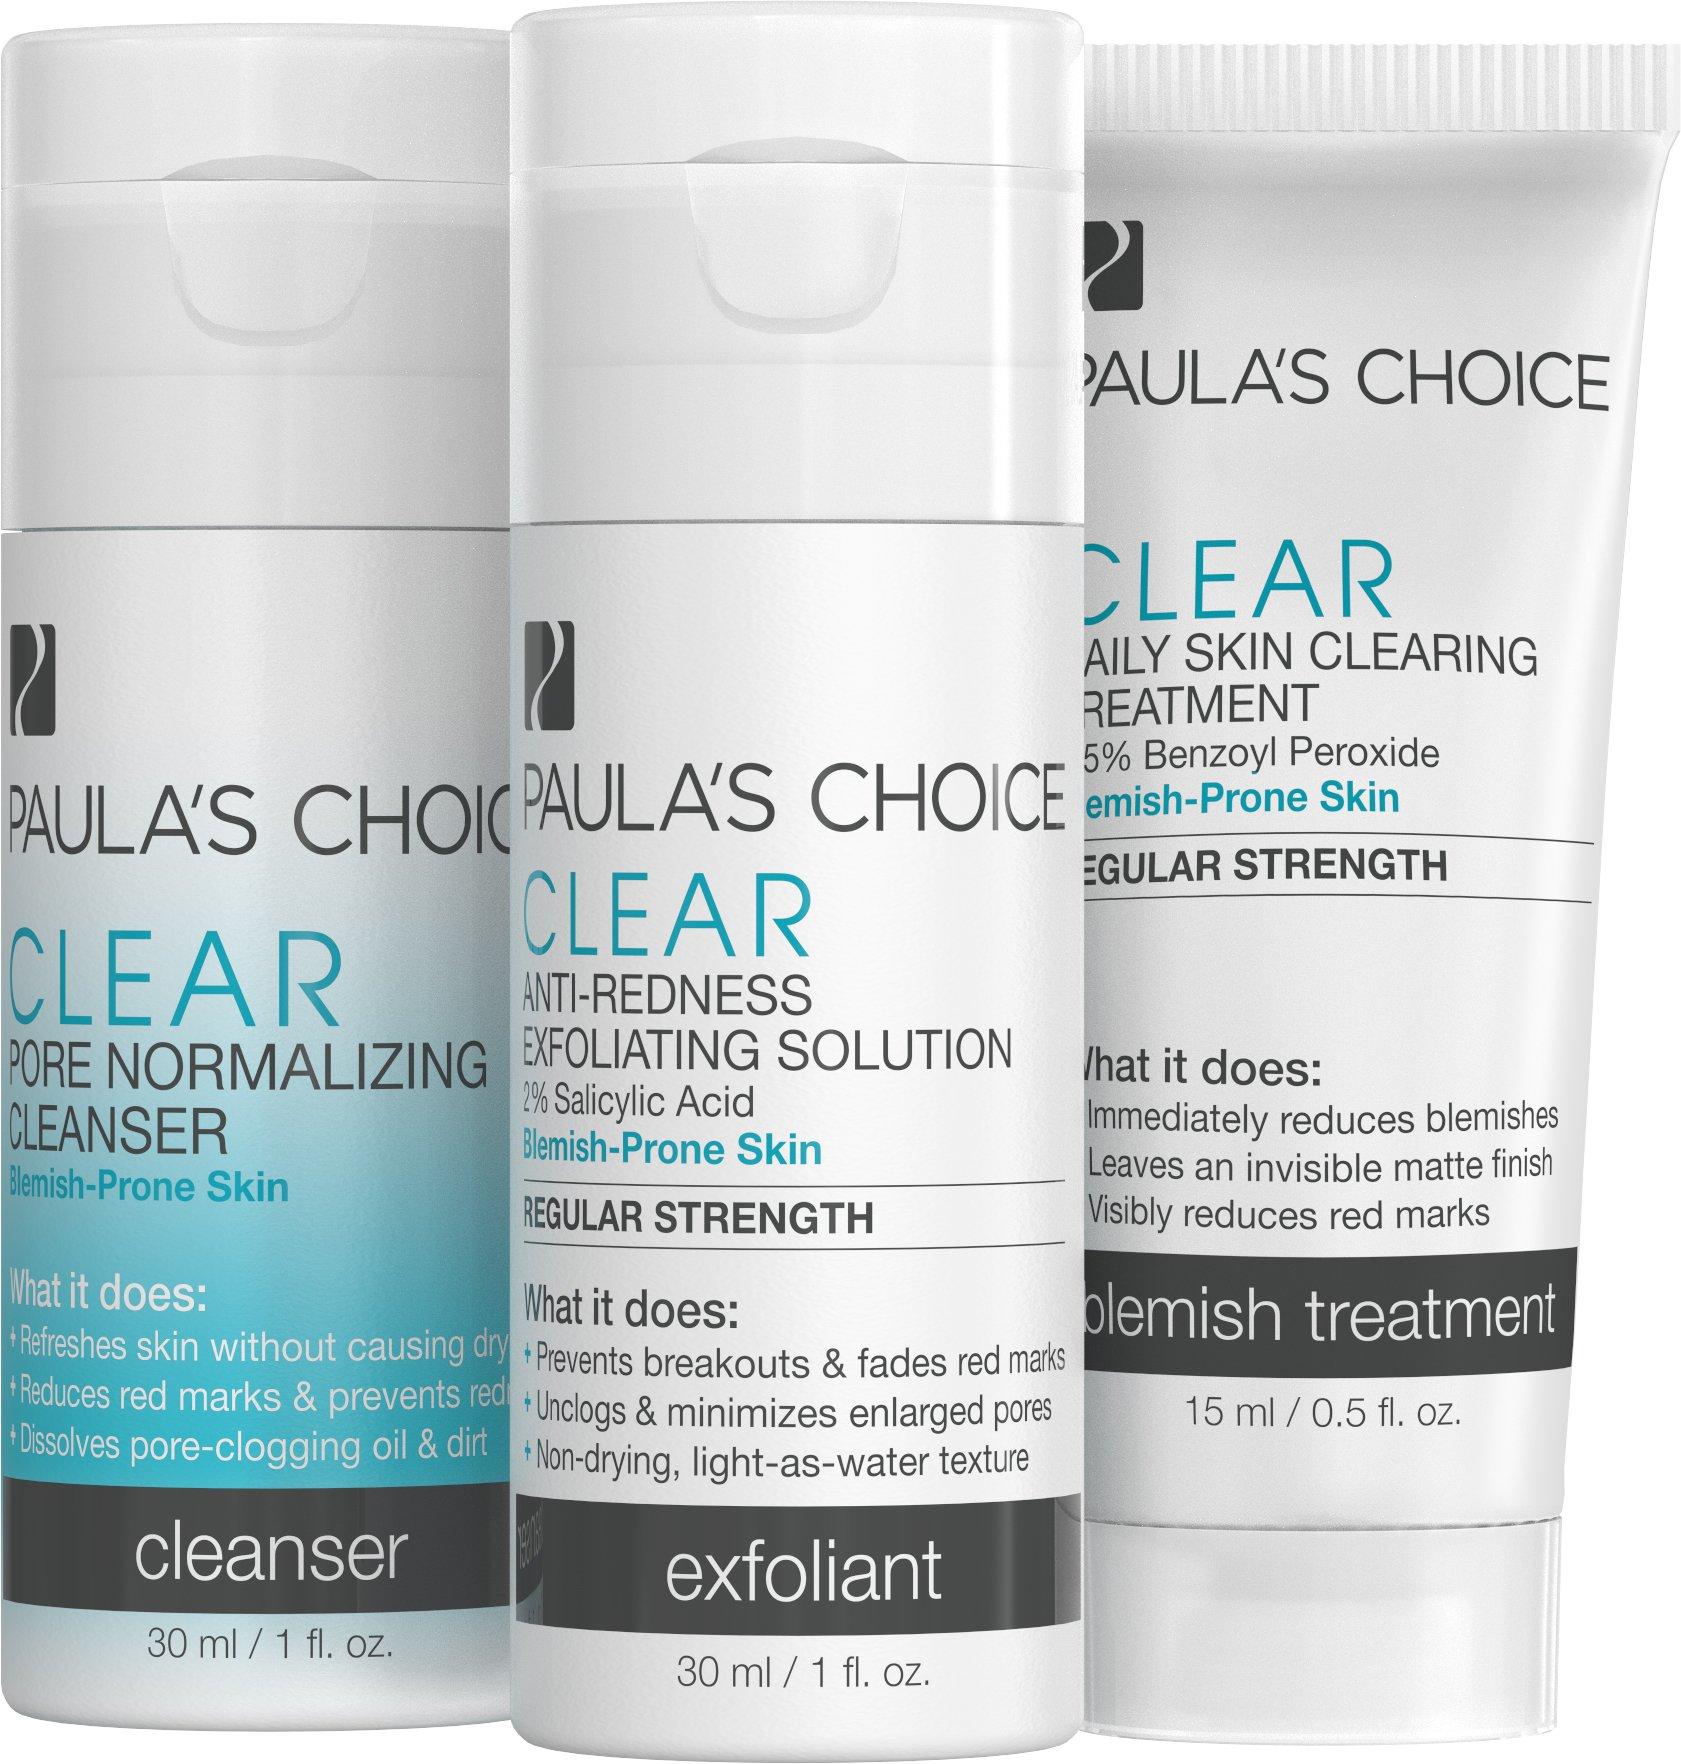 Paula's Choice Paula's Choice Clear Regular Strength Acne Trial Kit 2% Salicylic Acid & 2.5% Benzoyl Peroxide for Moderate Acne